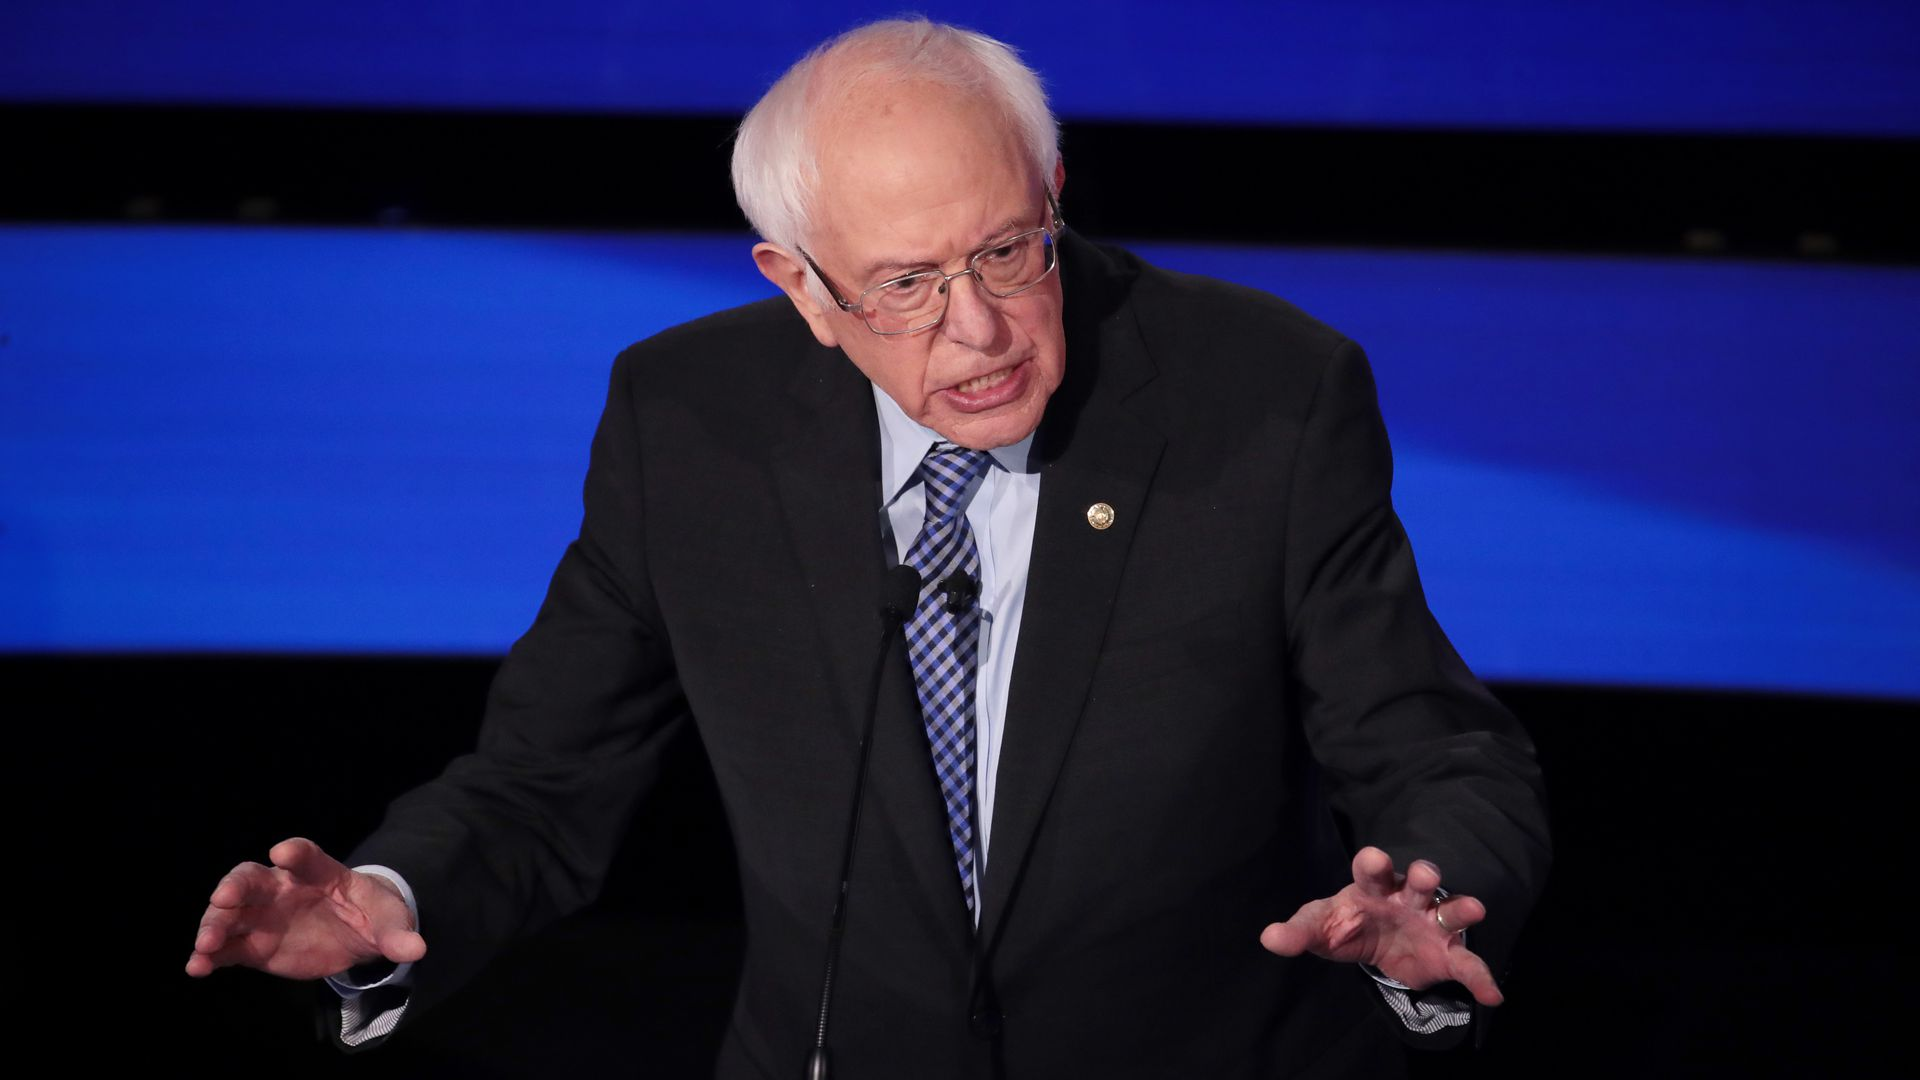 Sanders leads over Biden among Democratic candidates: CNN poll